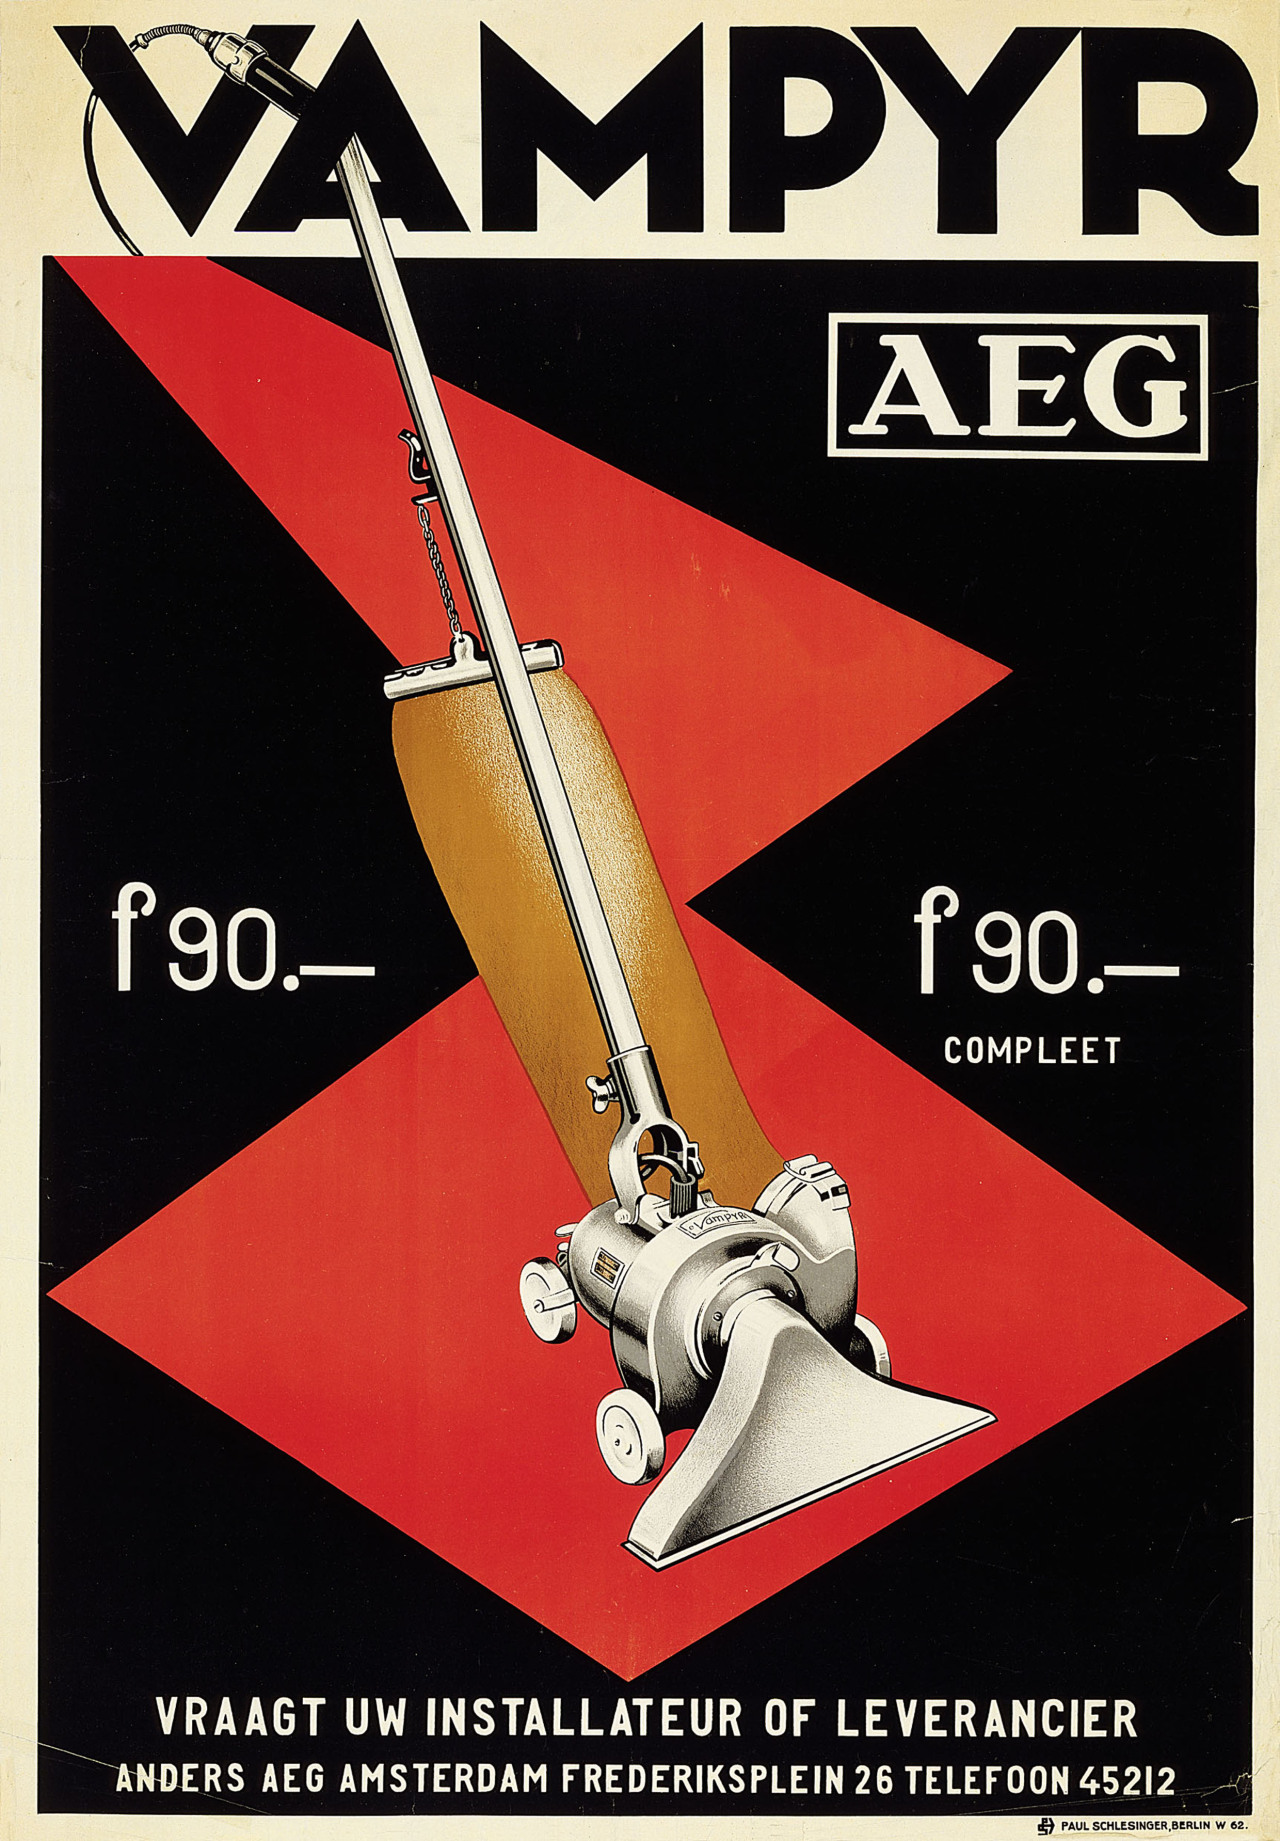 Design is fine  AEG poster for Vampyr vacuum cleaner